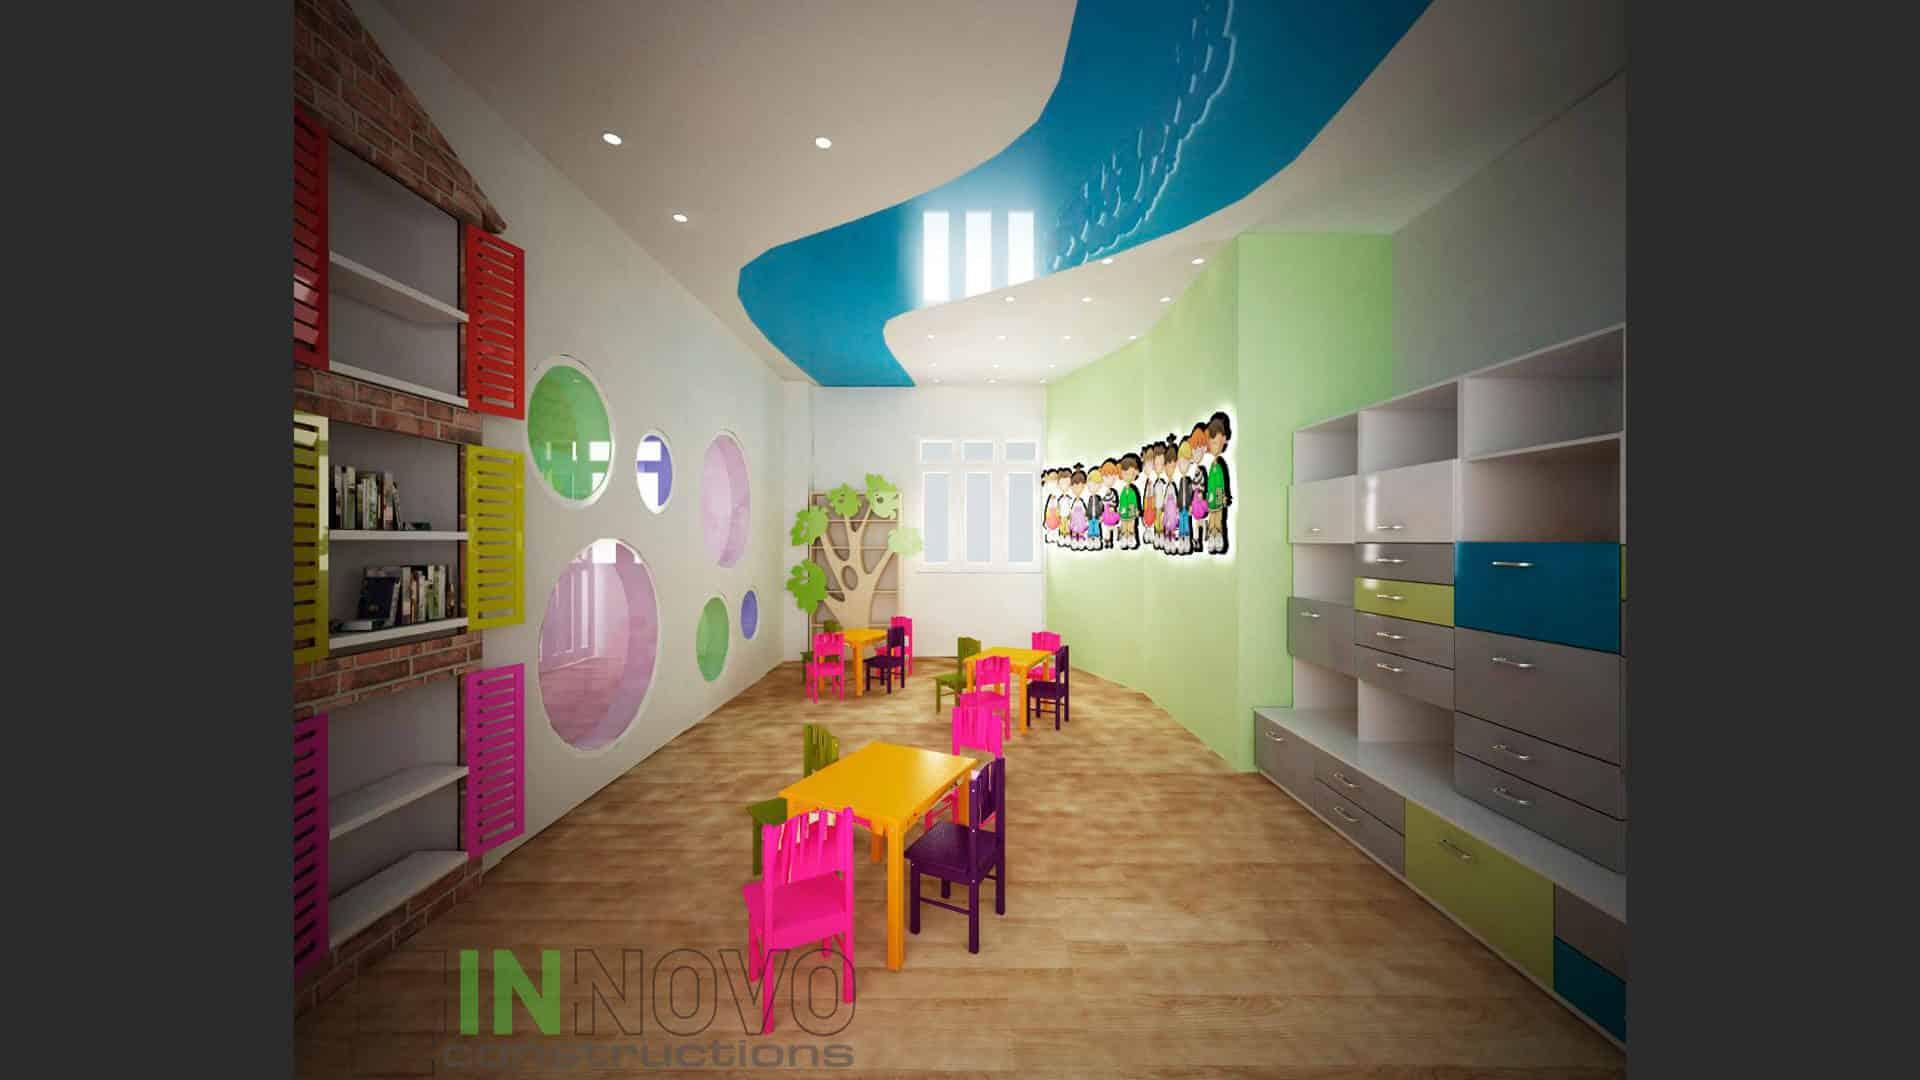 anakainisi-paidikou-stathmou-nursery-renovation-paidikos-stathmos-glyfada-2182-3